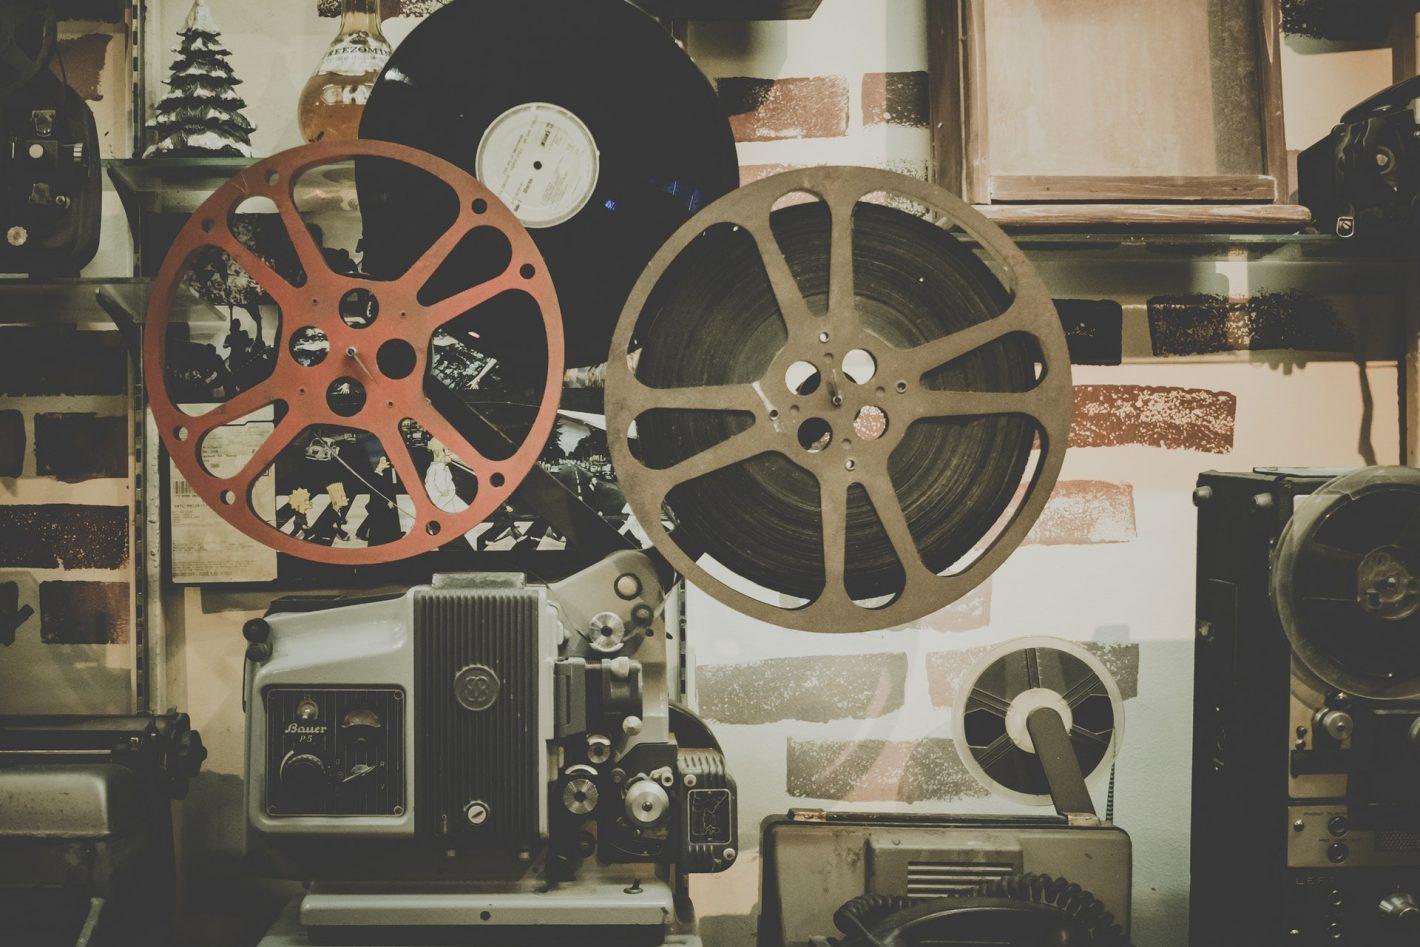 Film traka, slika: https://www.pexels.com